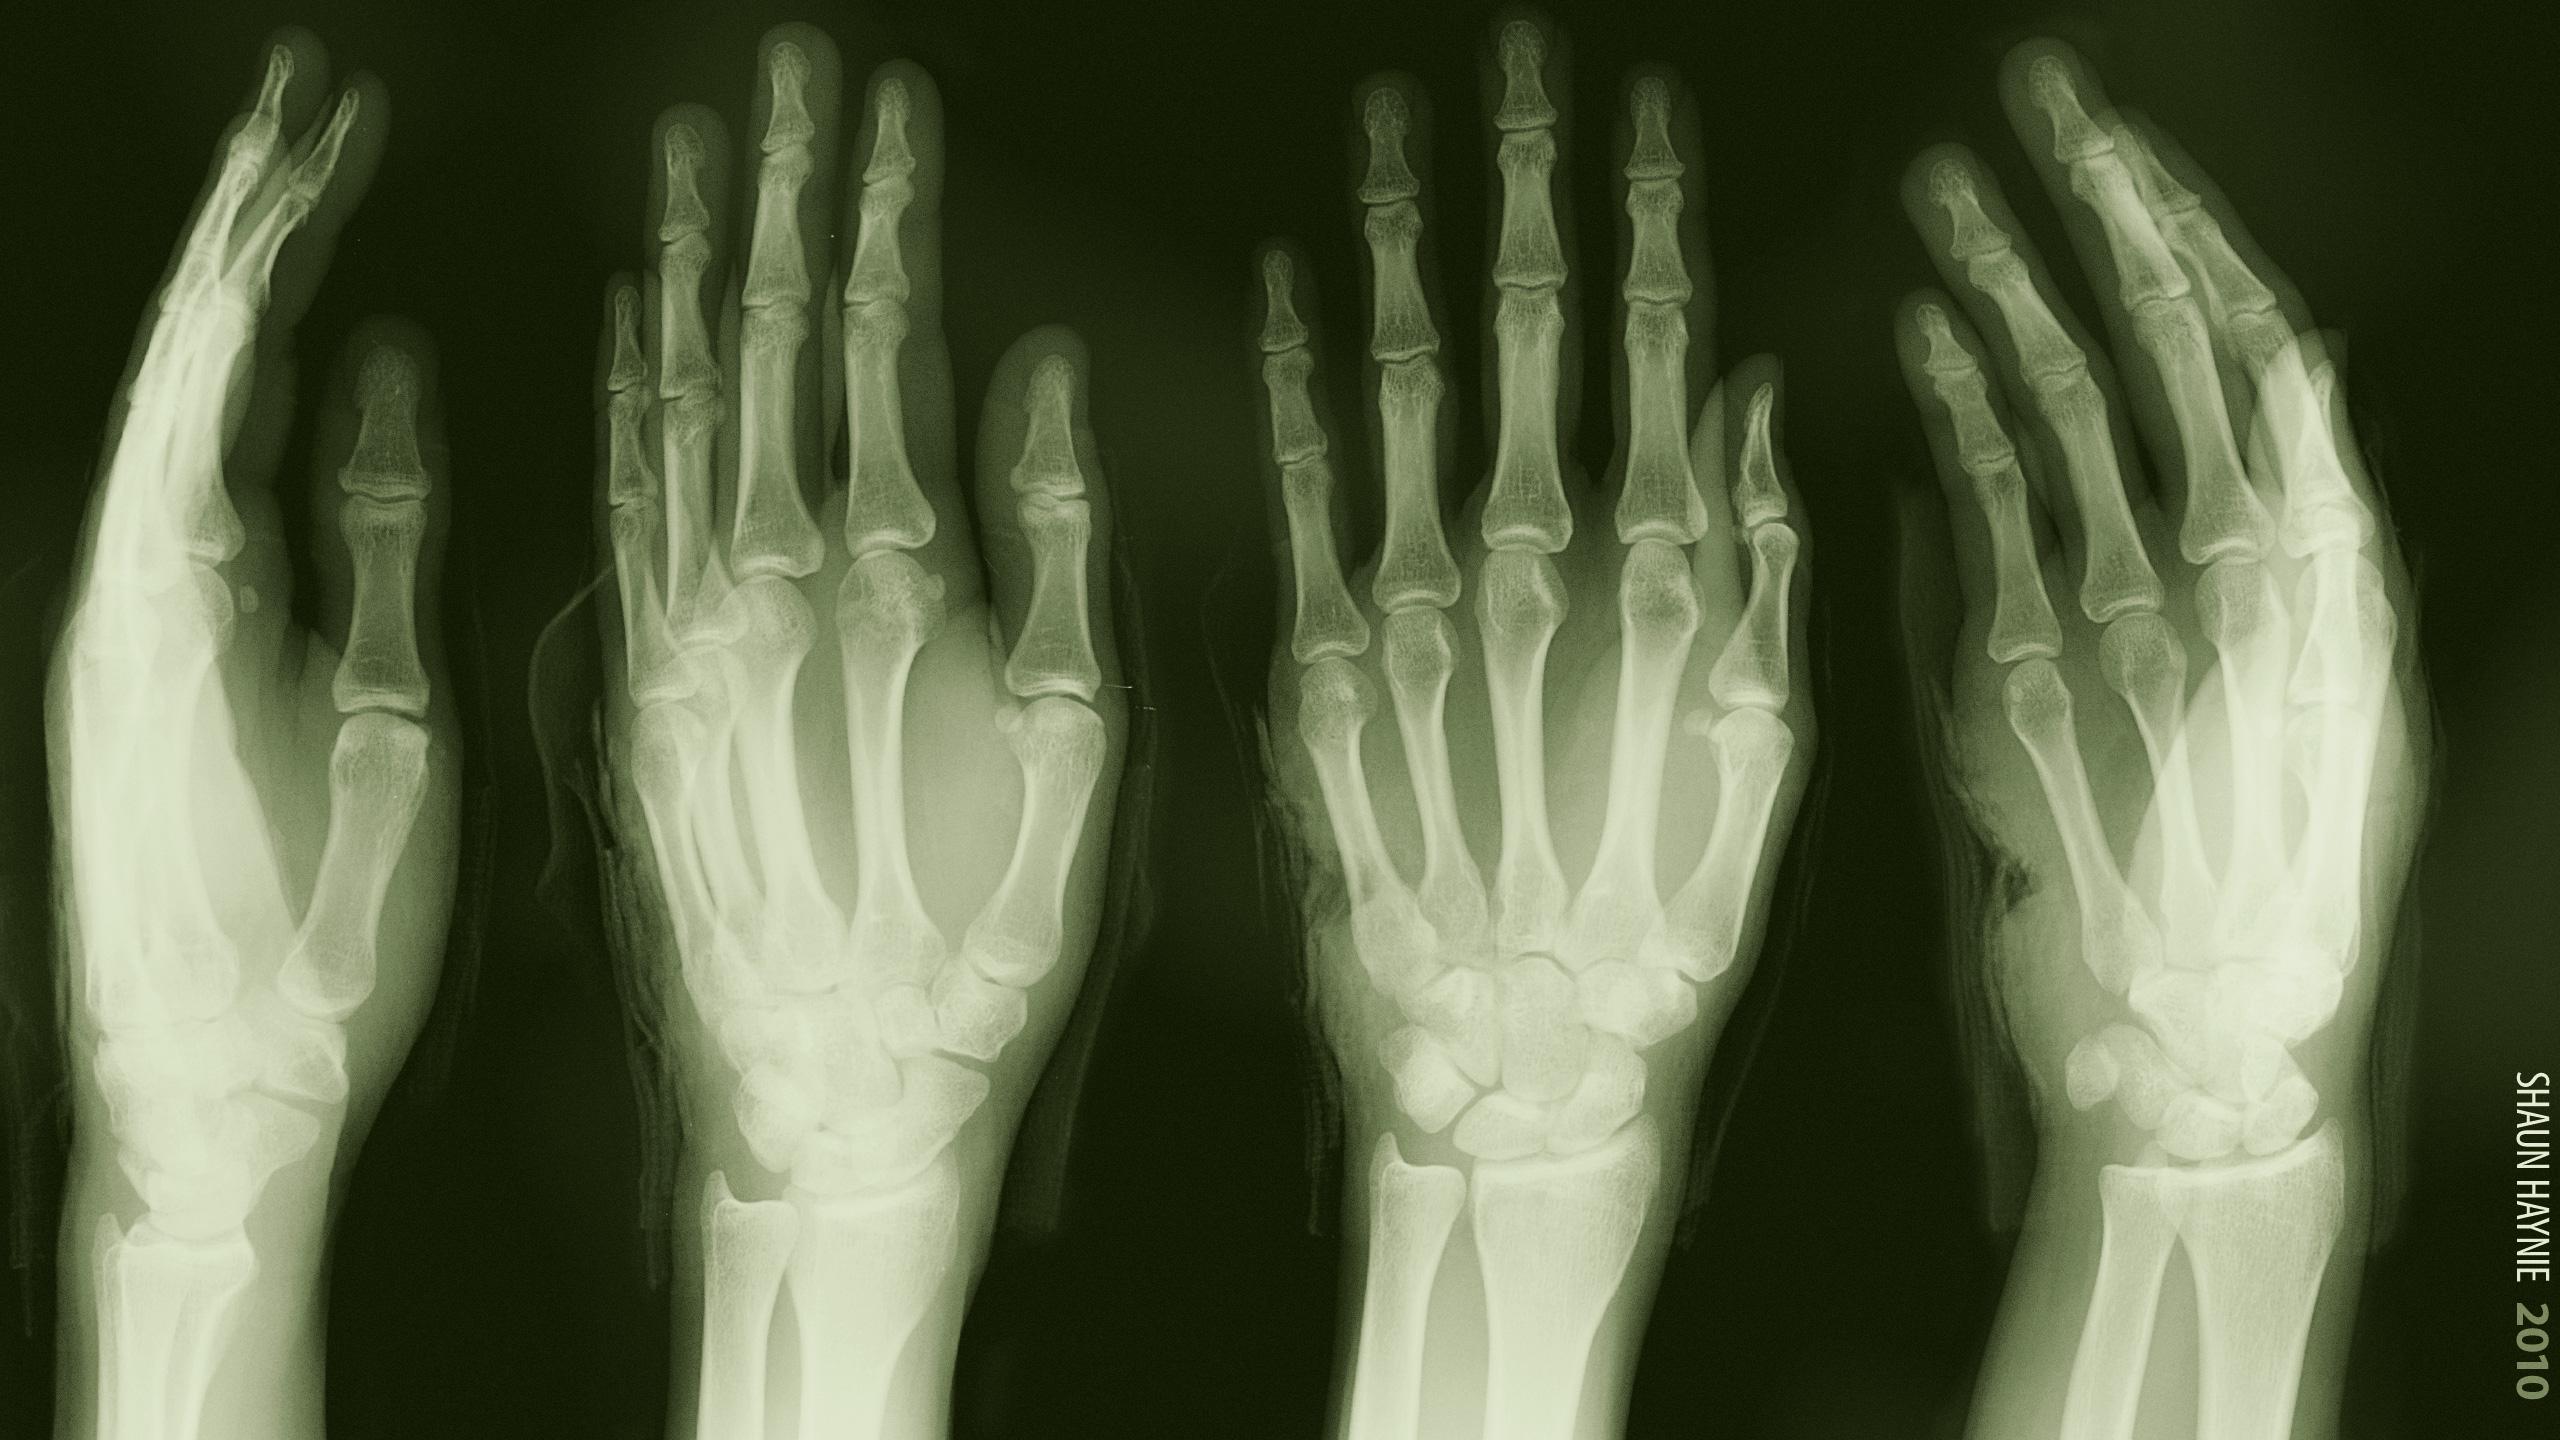 Shauns Injury Computer Wallpapers Desktop Backgrounds 2560x1440 2560x1440